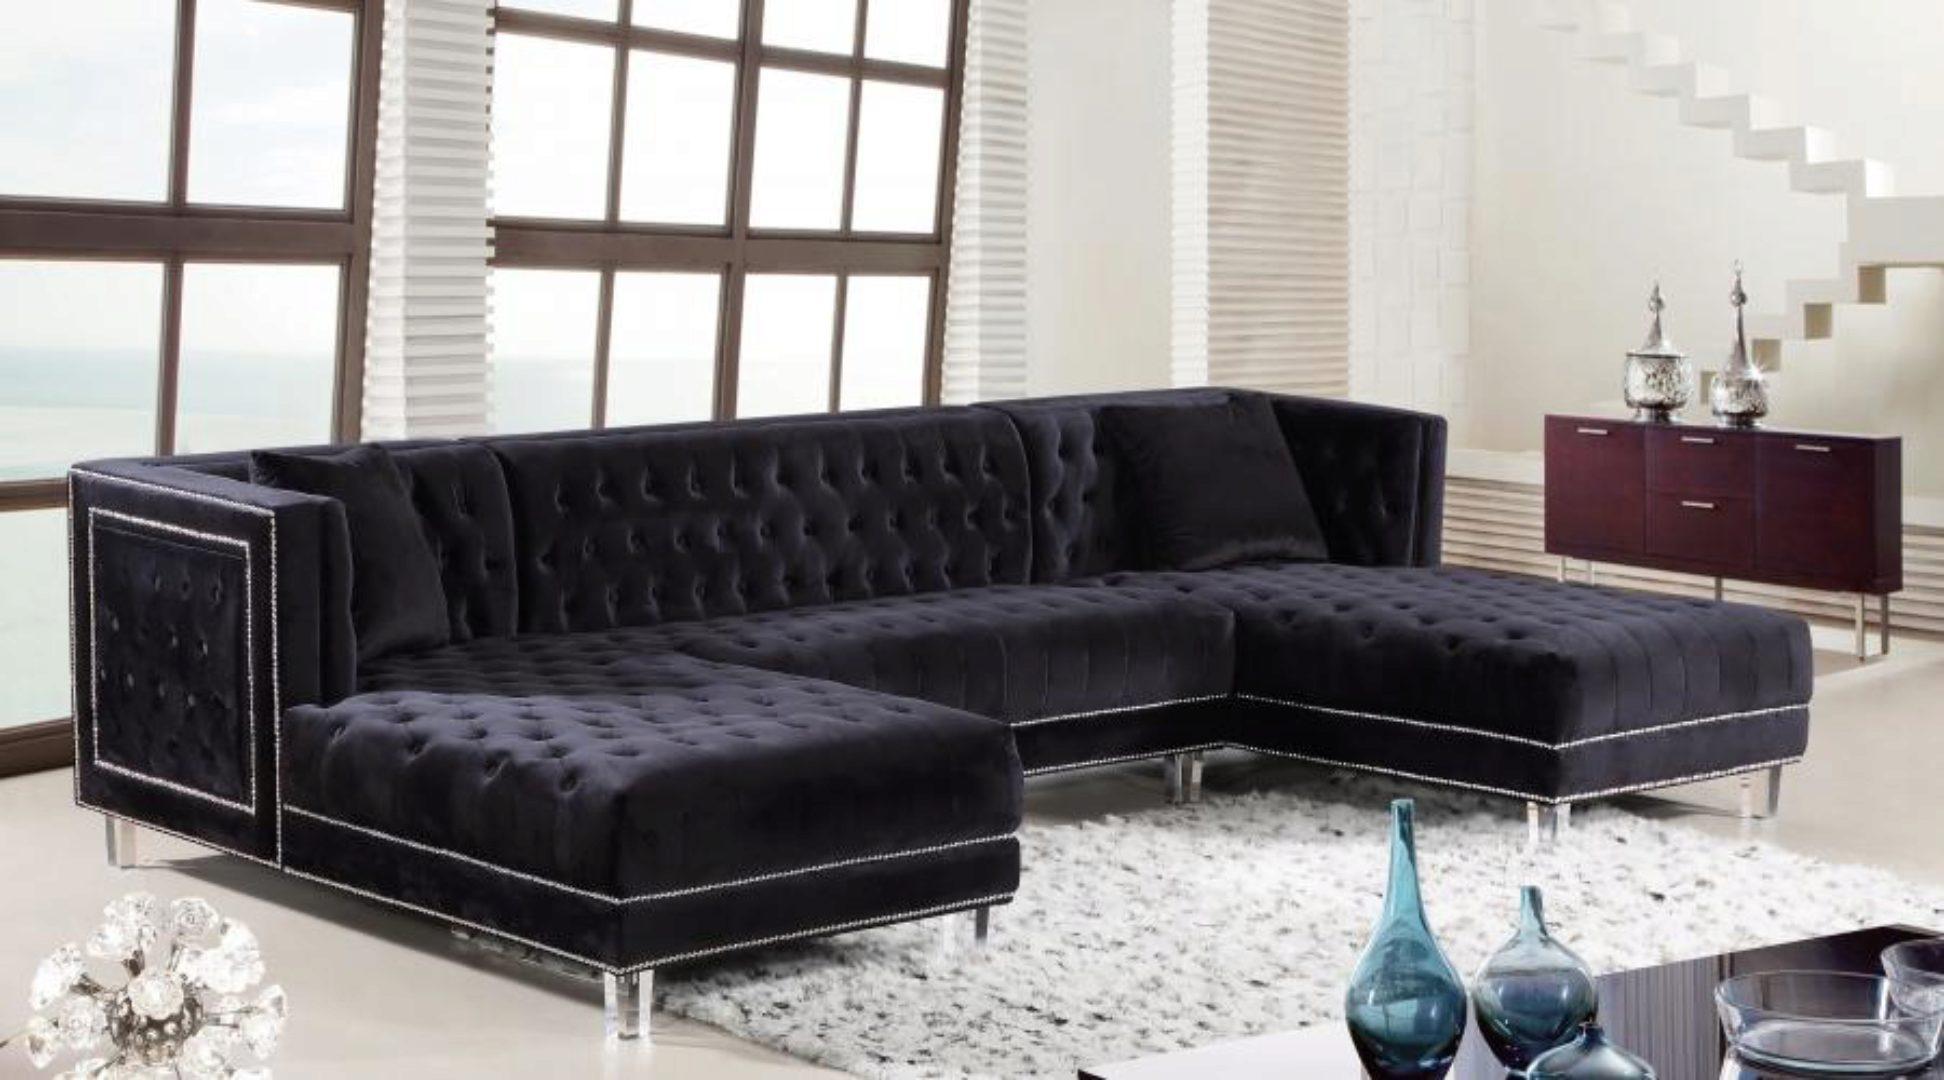 meridian furniture 631 moda black velvet acrylic legs double chaise sectional